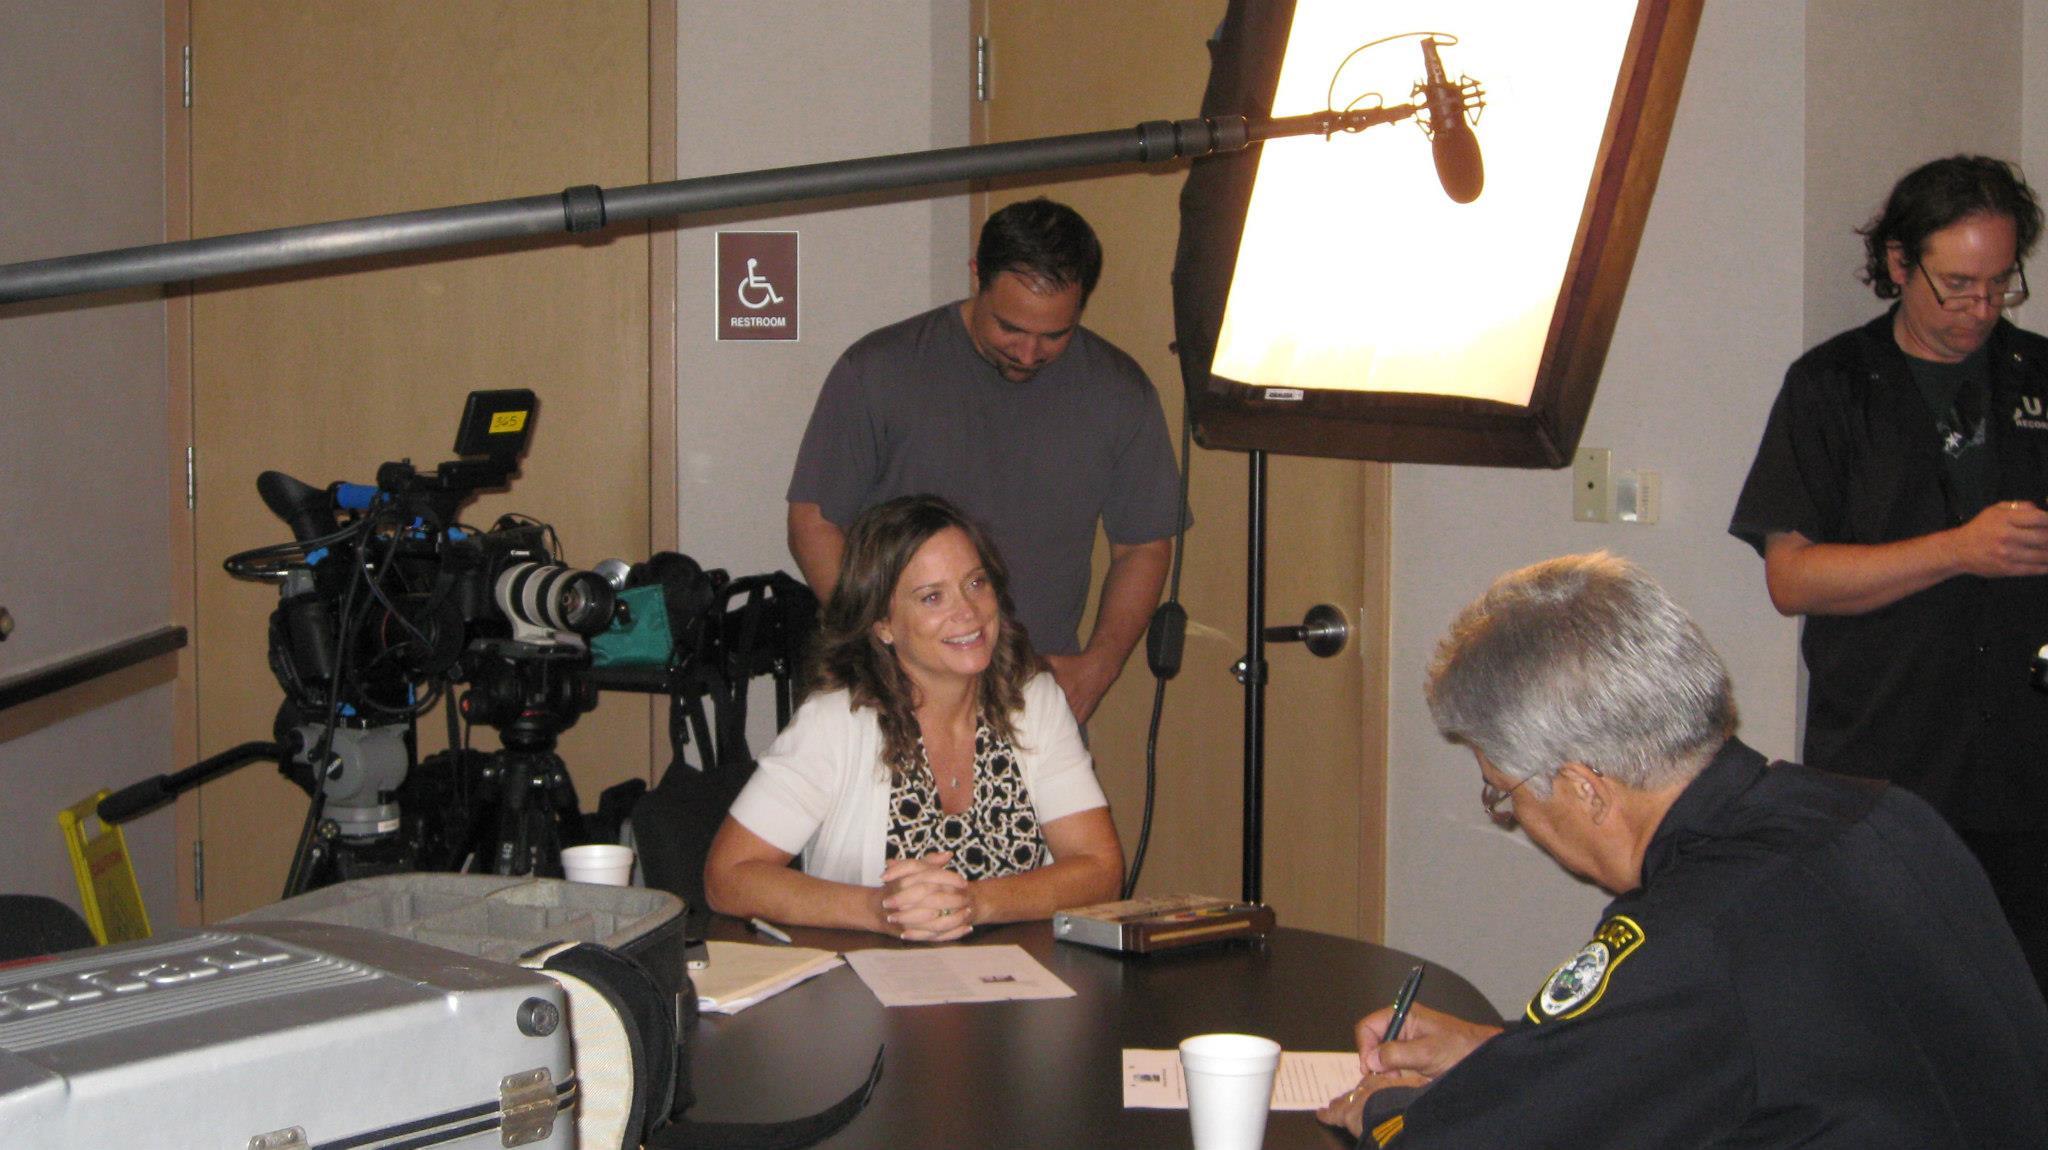 Kristin-Behind-Scenes